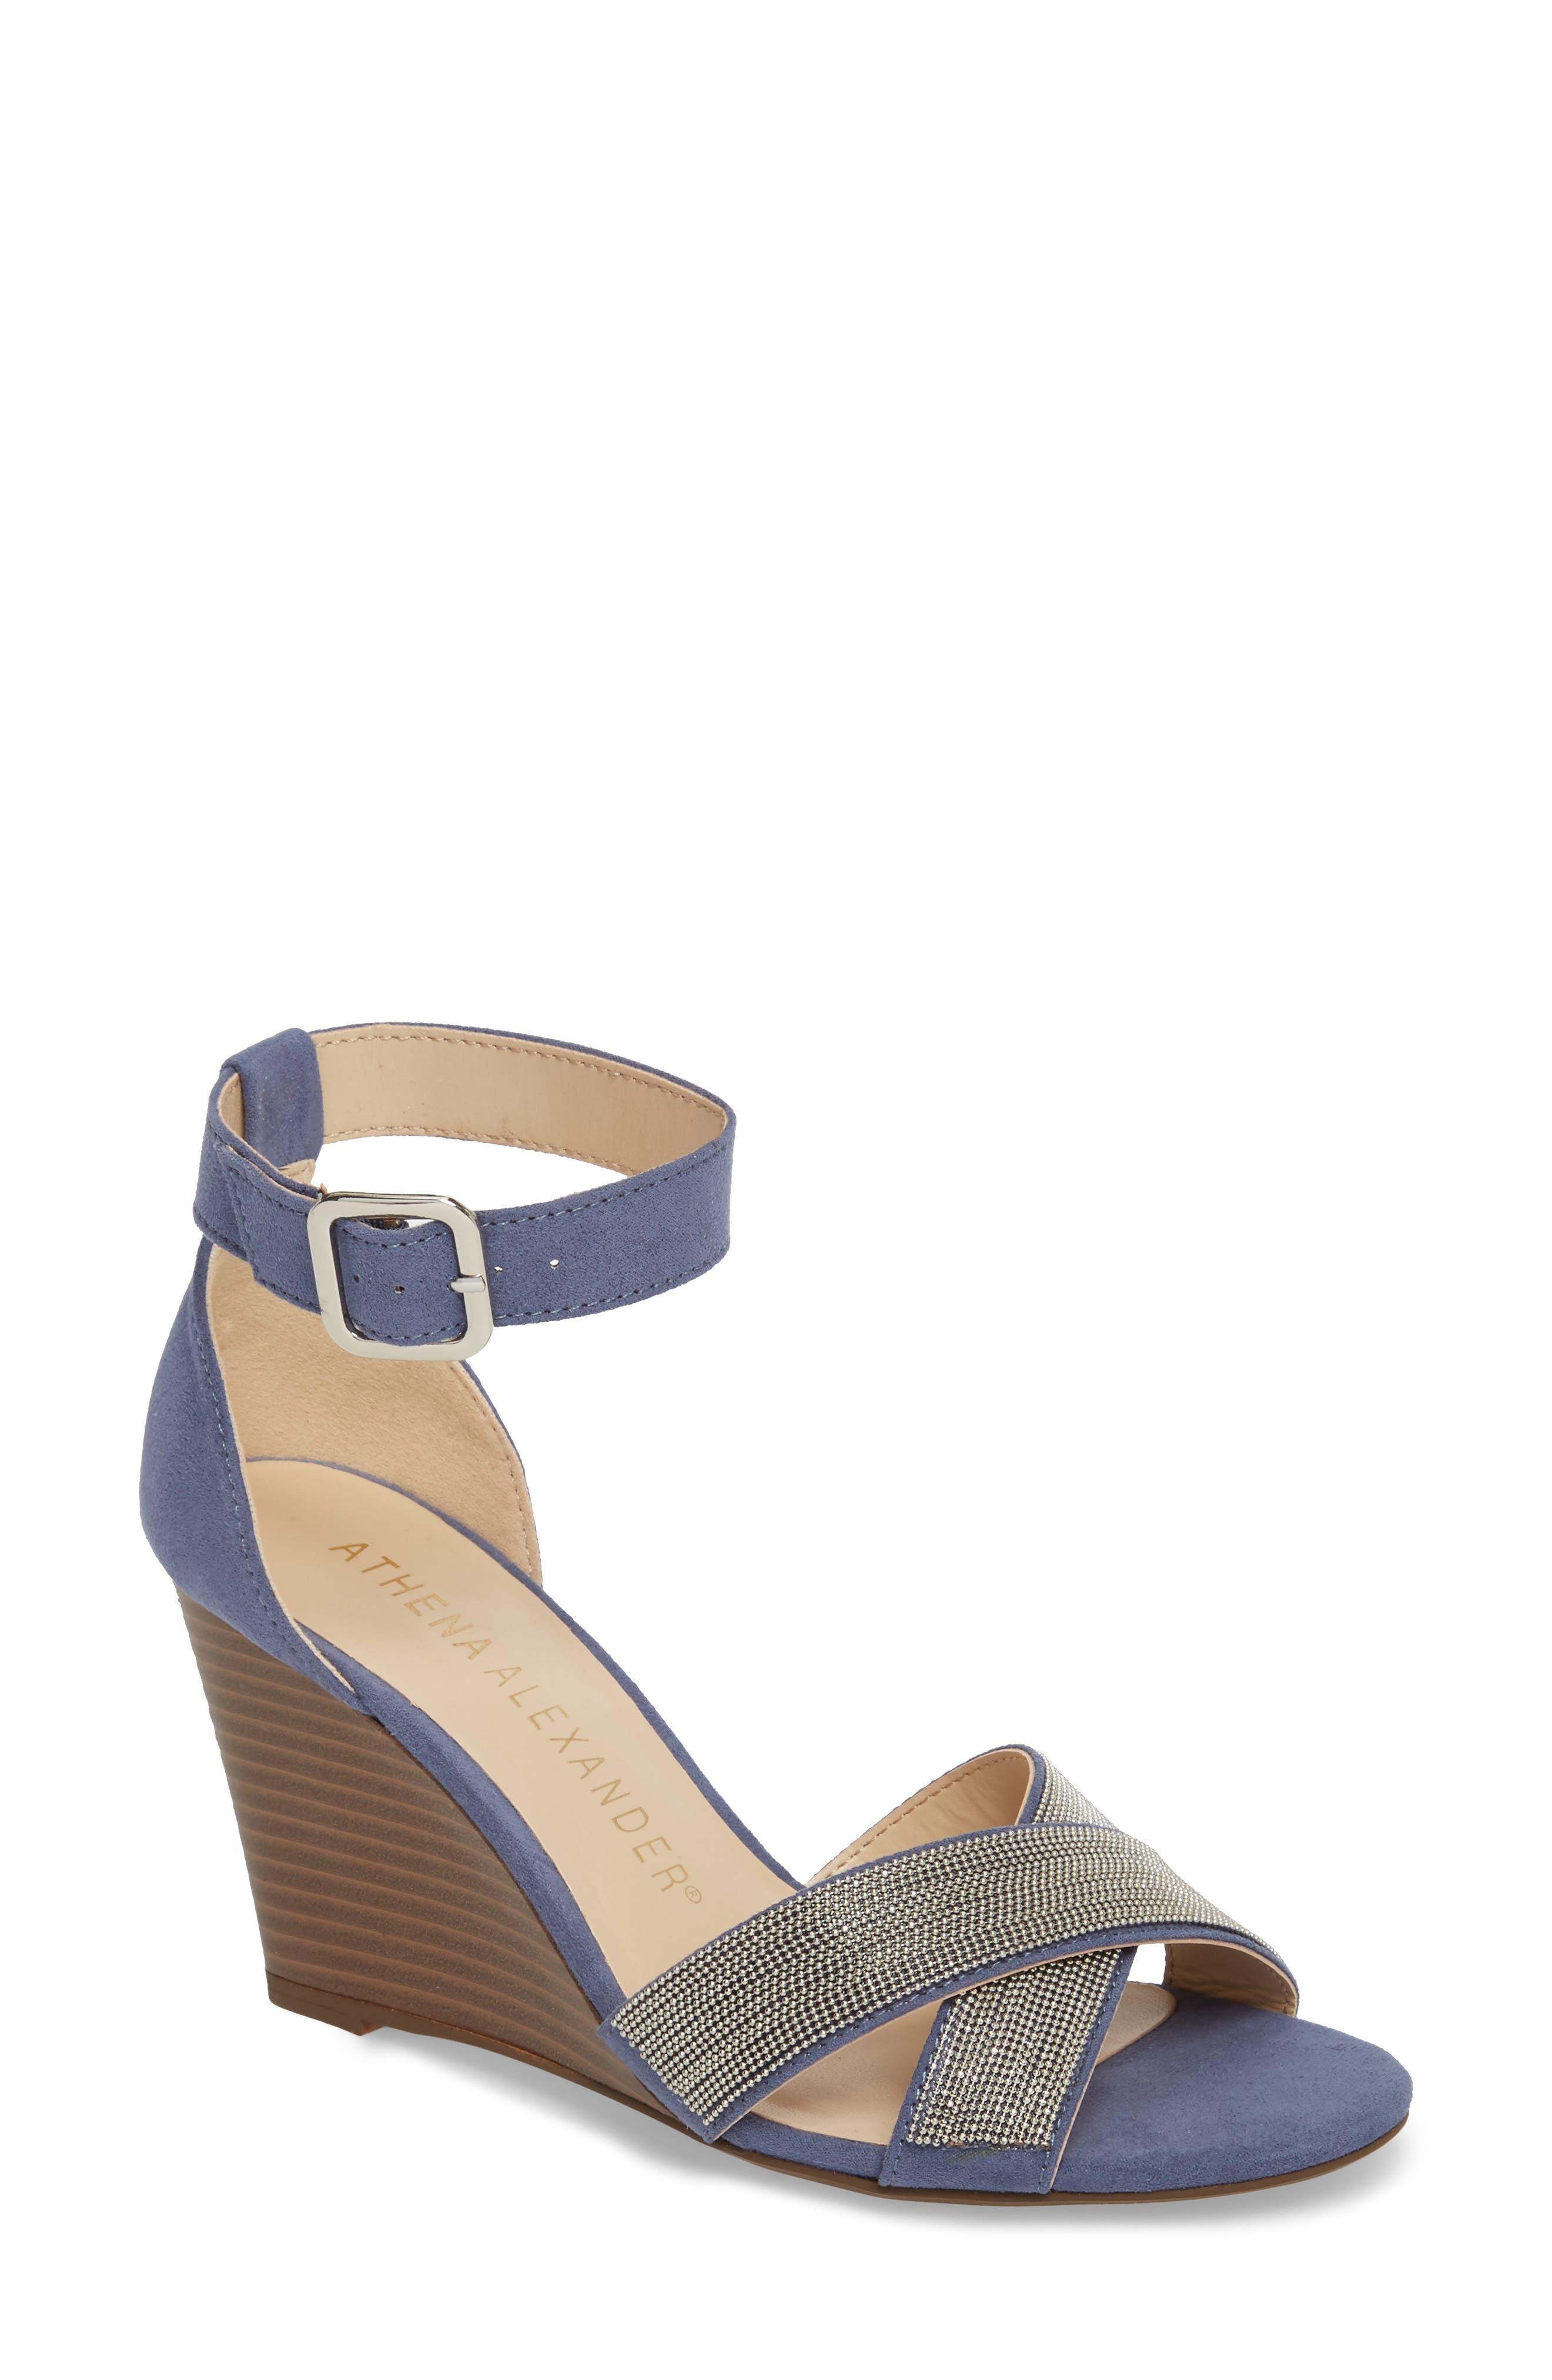 Athena Alexander Zorra Wedge Sandal (Women)